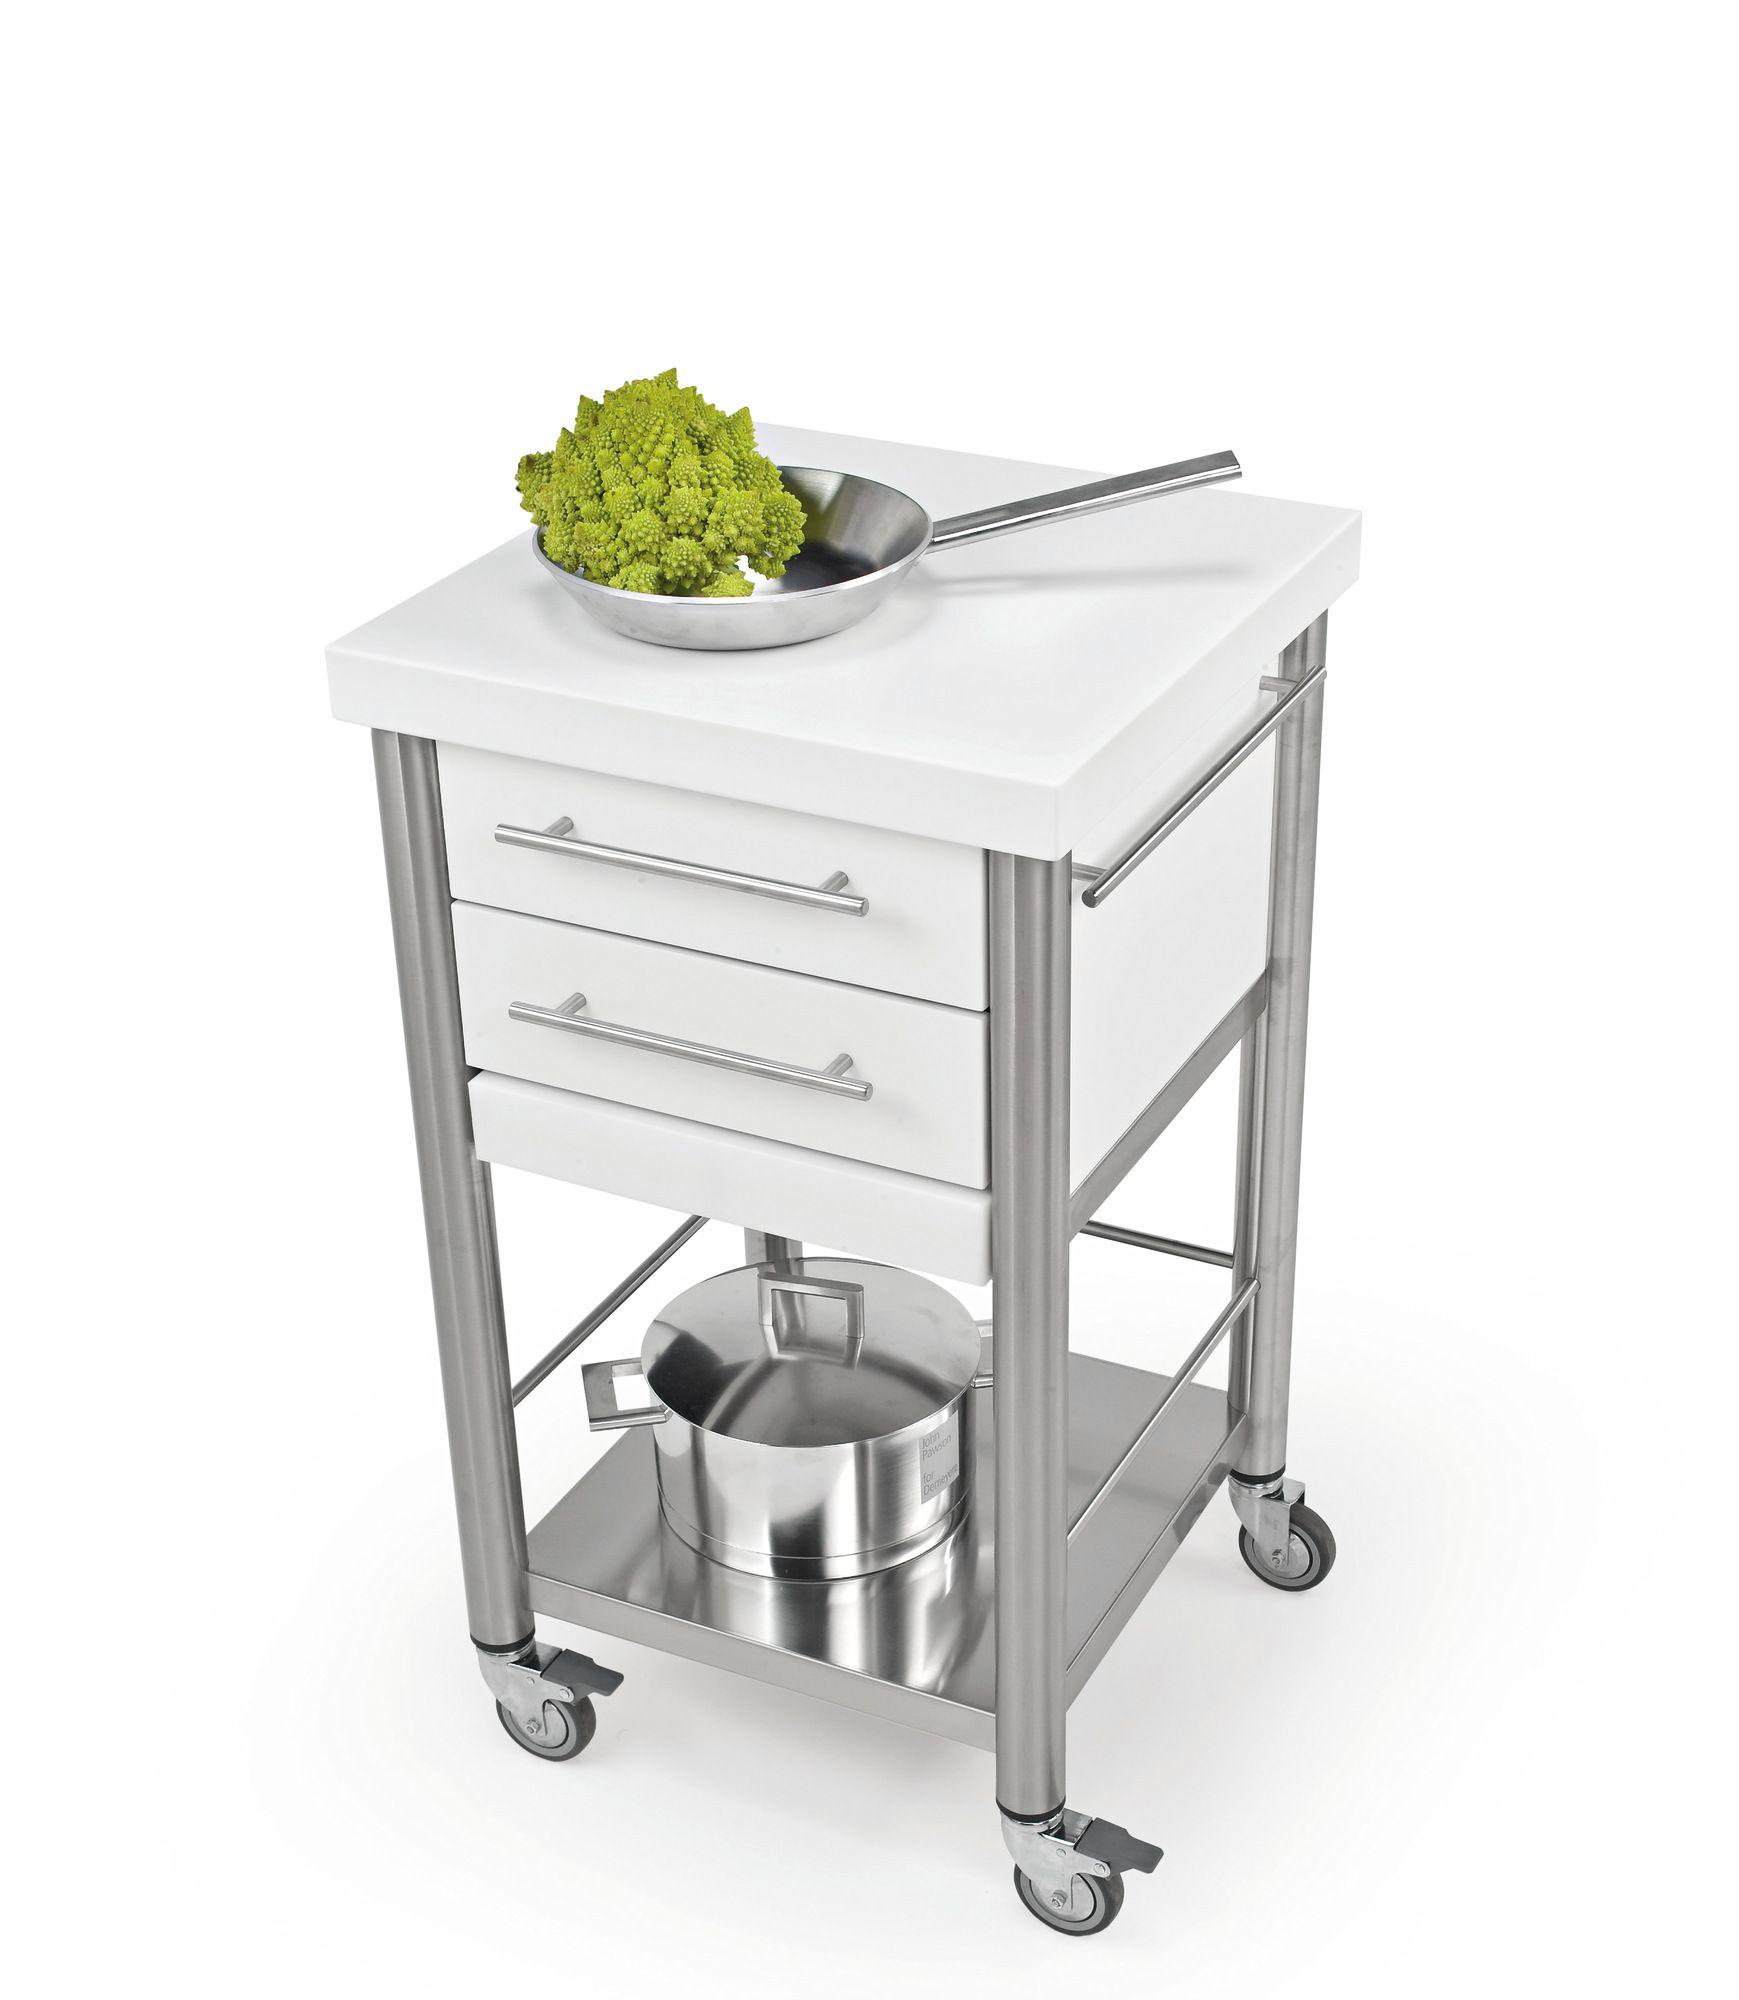 690702 modulo cucina freestanding by jokodomus - Cucina freestanding prezzi ...